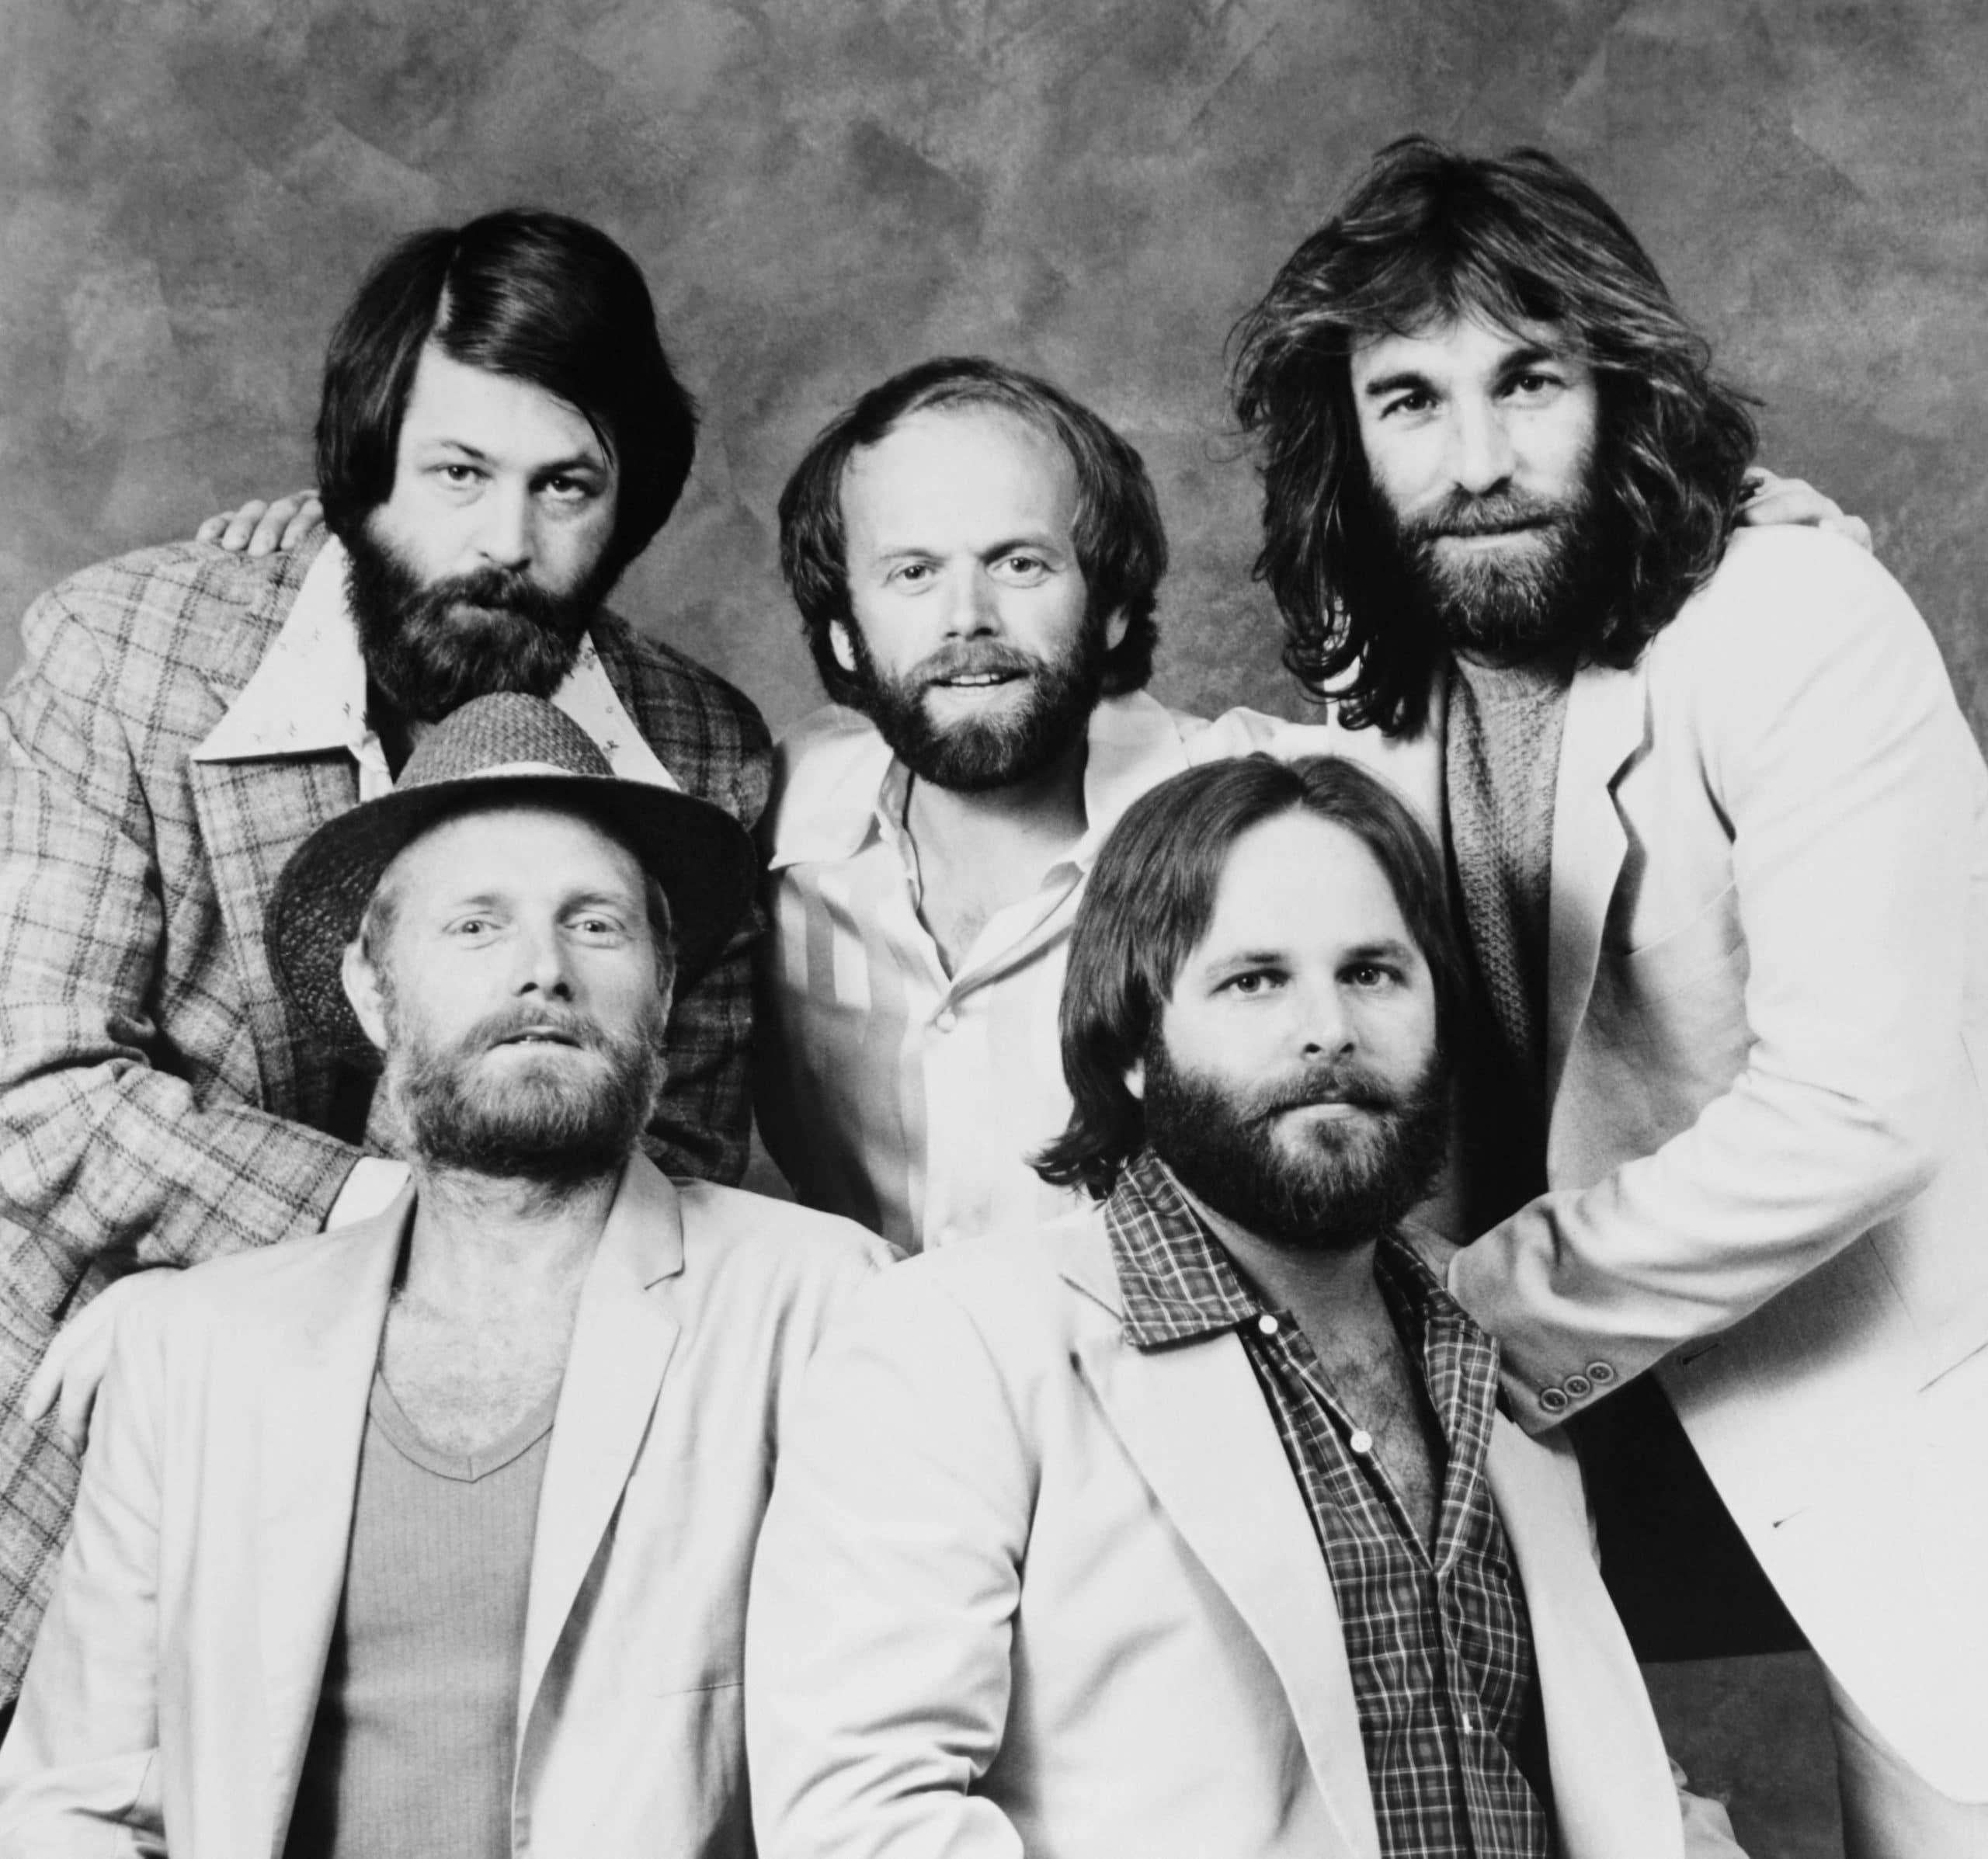 The Beach Boys, front from left: Mike Love, Carl Wilson, rear from left: Brian Wilson, Al Jardine, Dennis Wilson, 1970s